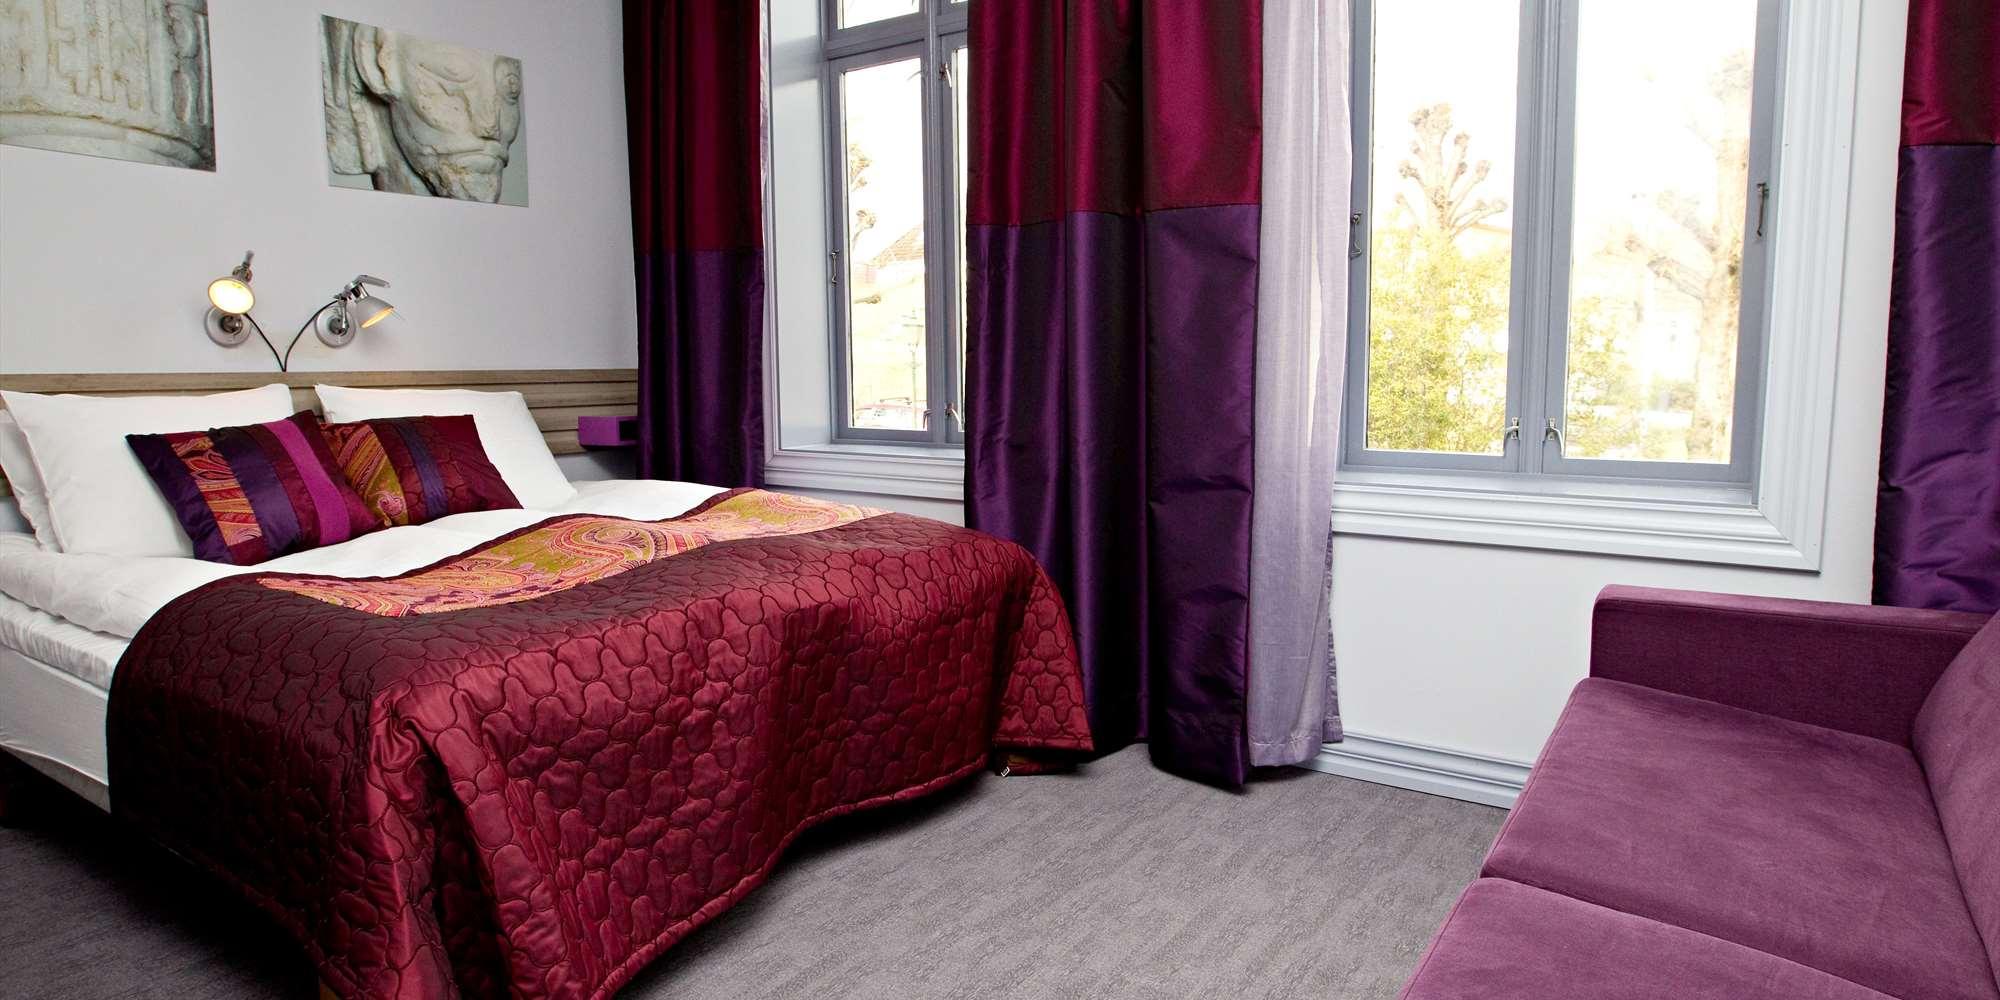 Klosterhagen Hotell - Doppelzimmer